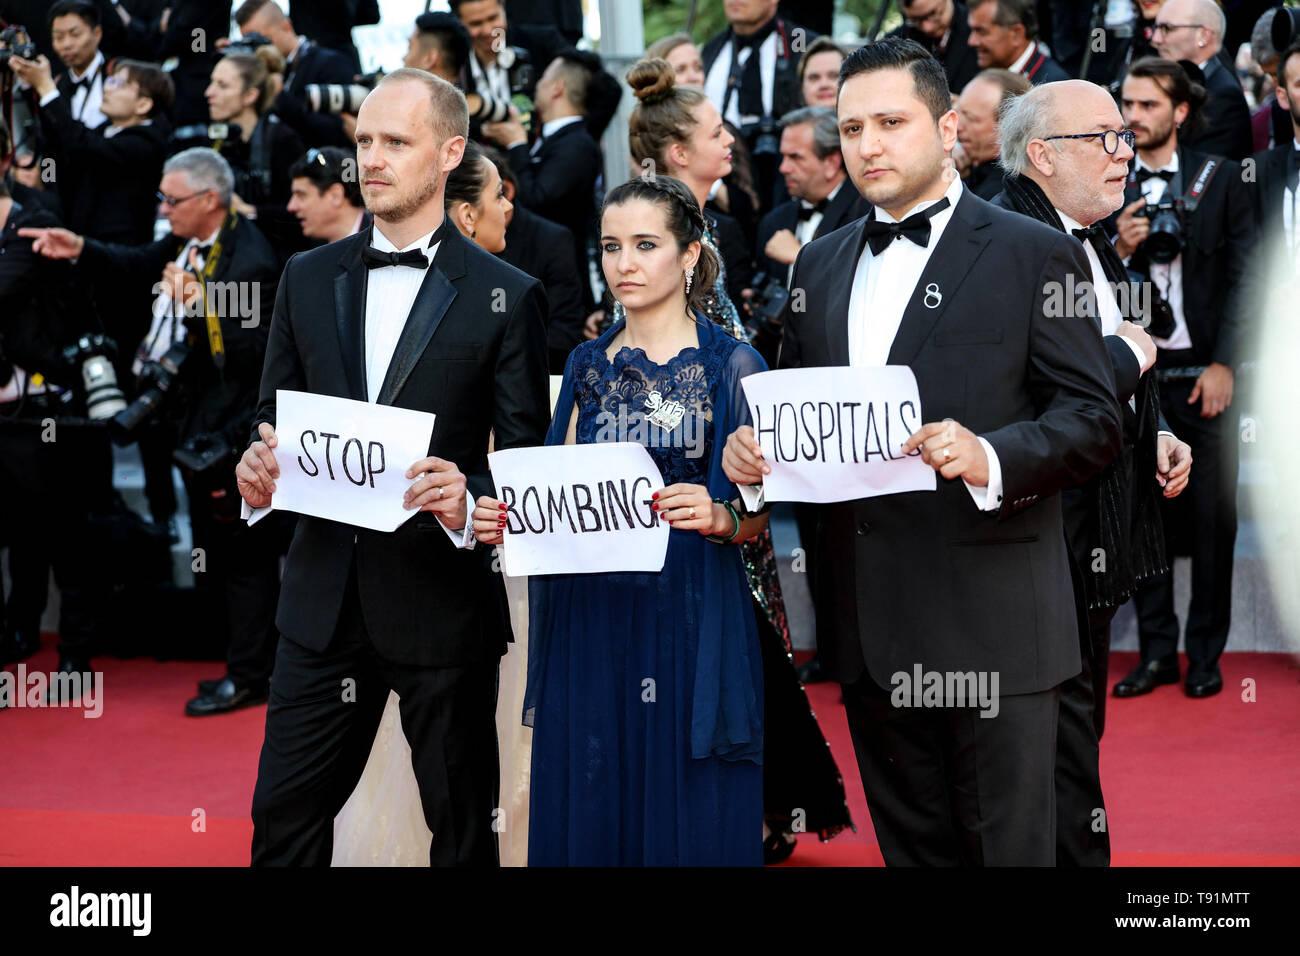 "El Festival de Cannes. El 15 de mayo, 2019. Los huéspedes llega al estreno de ""LES MISÉRABLES ' durante el 2019 Festival de Cannes el 15 de mayo de 2019 en el Palais des Festivals en Cannes, Francia. (Crédito: Lyvans Boolaky/Image Space/Media Punch)/Alamy Live News Foto de stock"